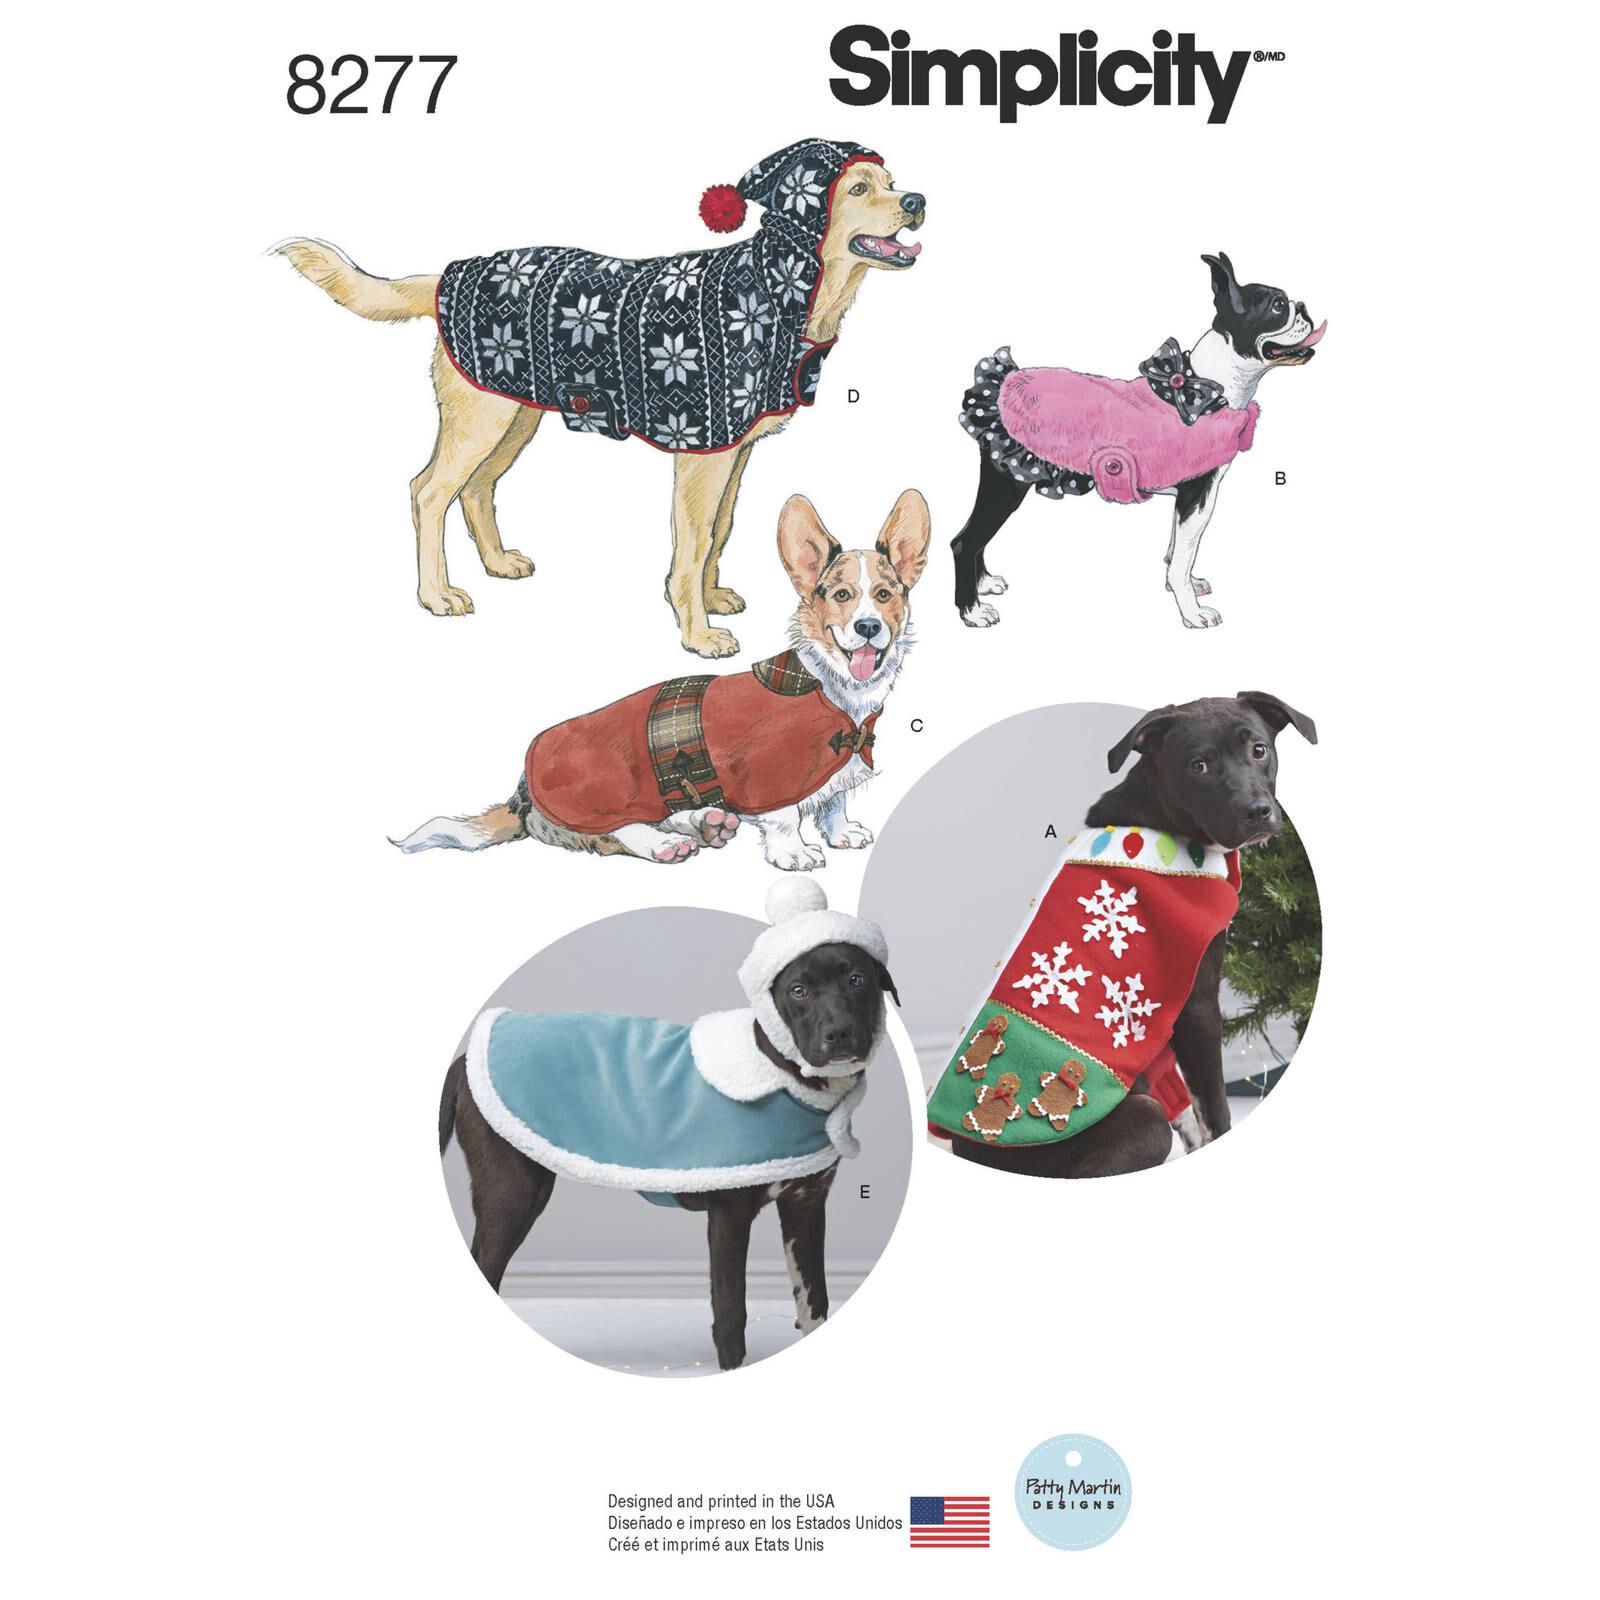 Simplicity - 8277